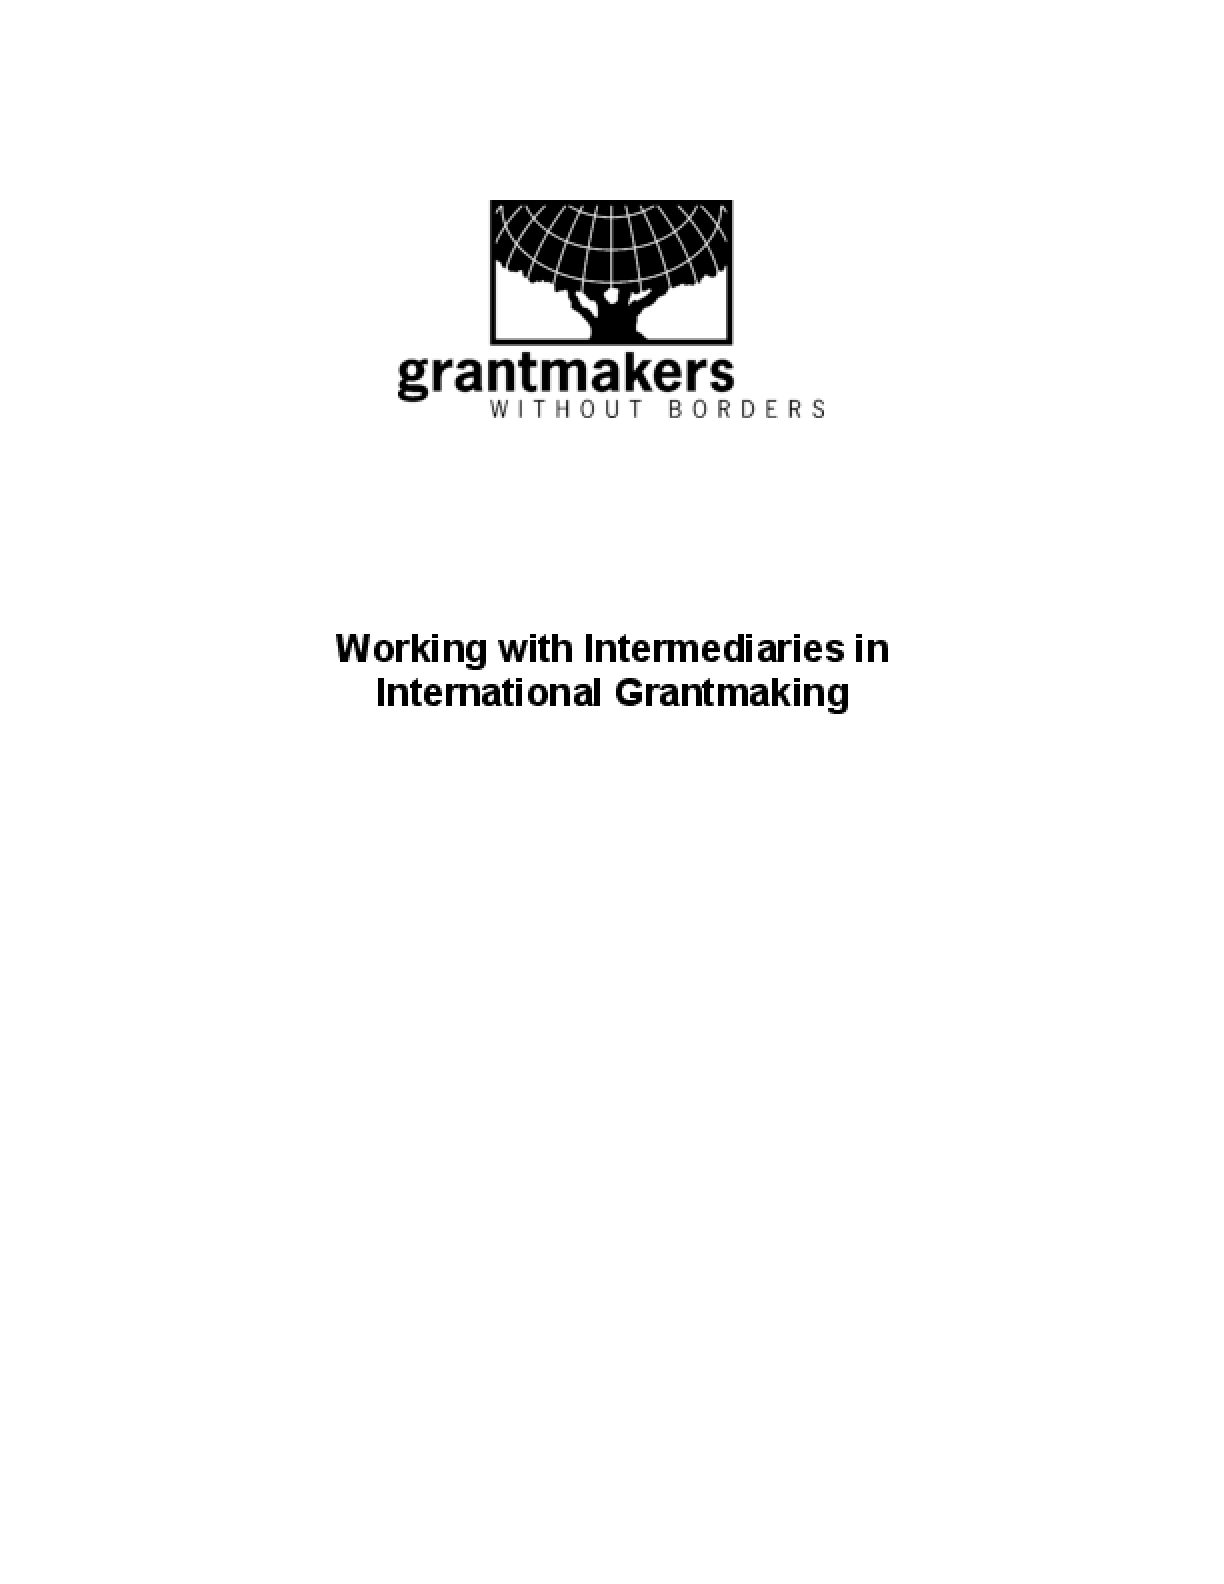 Working with Intermediaries in International Grantmaking